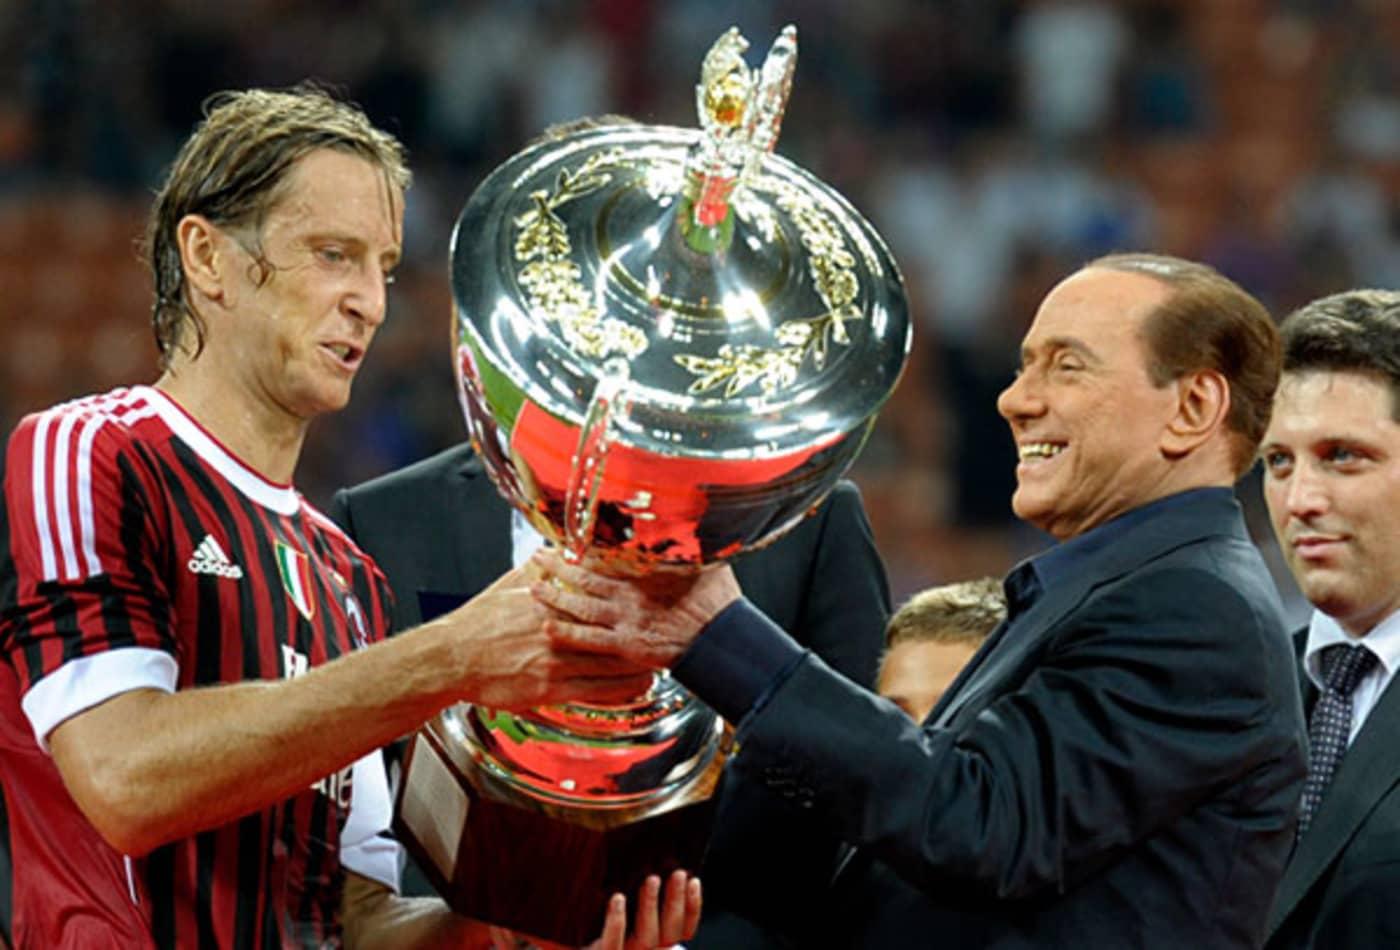 Silvio-Berlusconi-Billionaire-Sports-Team-Owners-CNBC.jpg